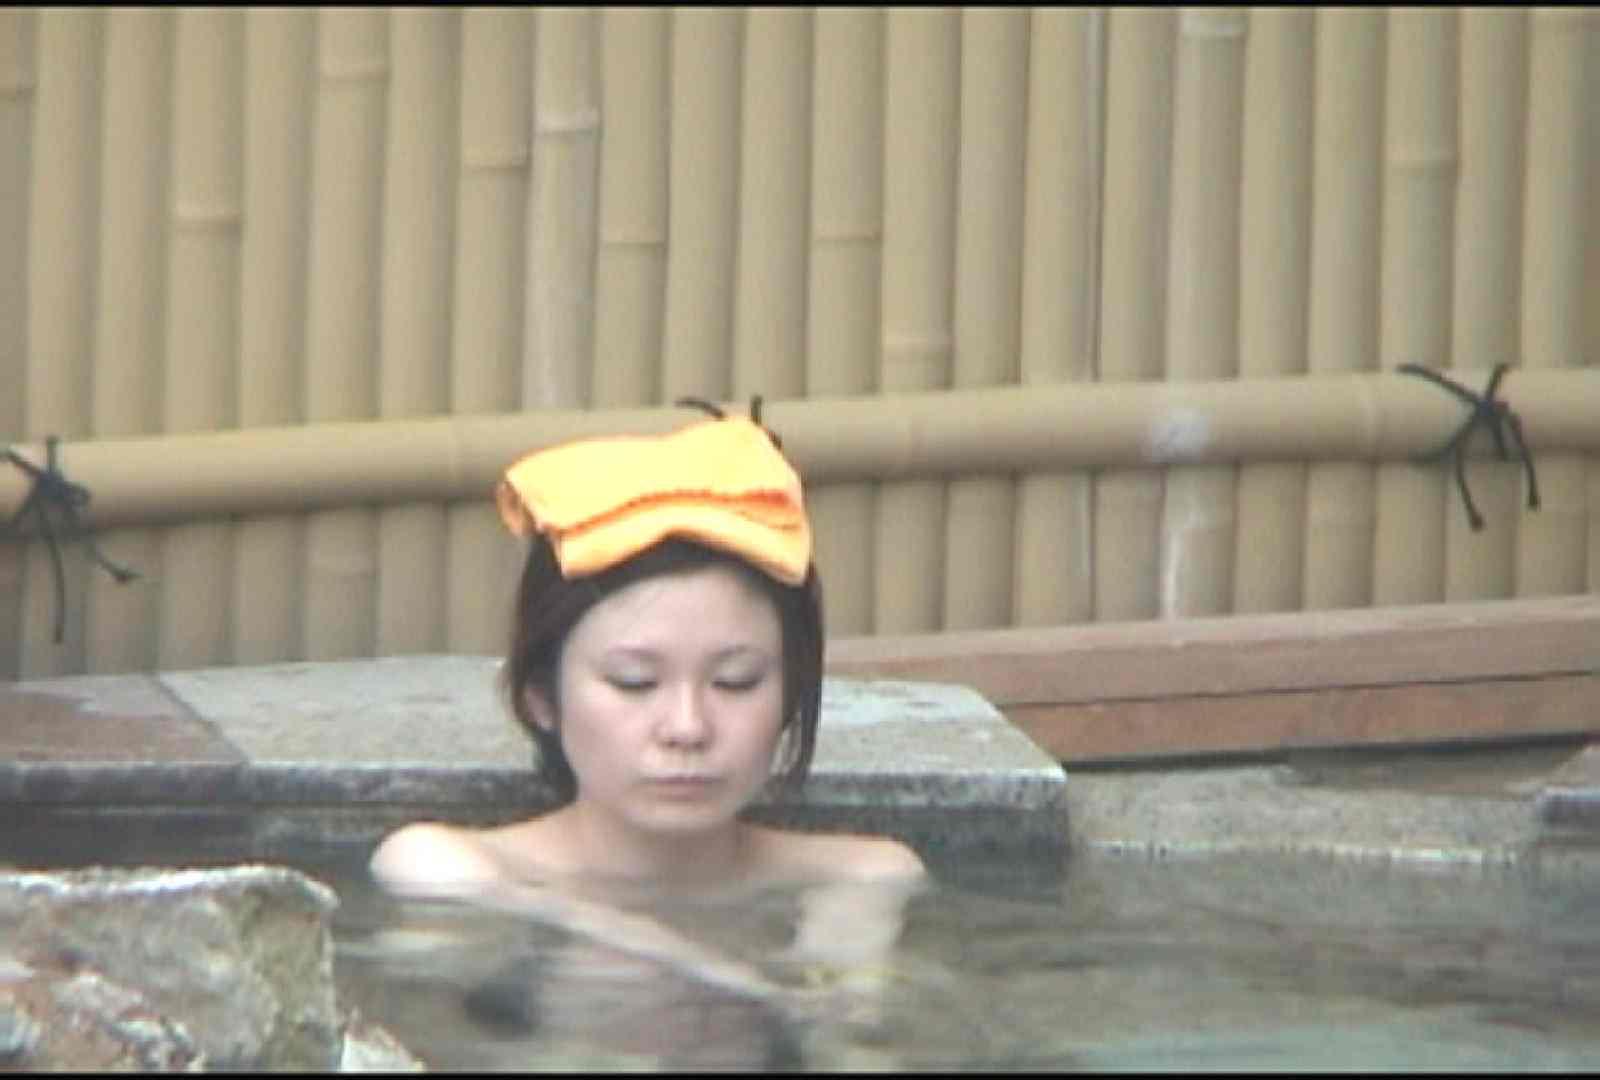 Aquaな露天風呂Vol.177 OLのエロ生活 オマンコ無修正動画無料 40連発 2